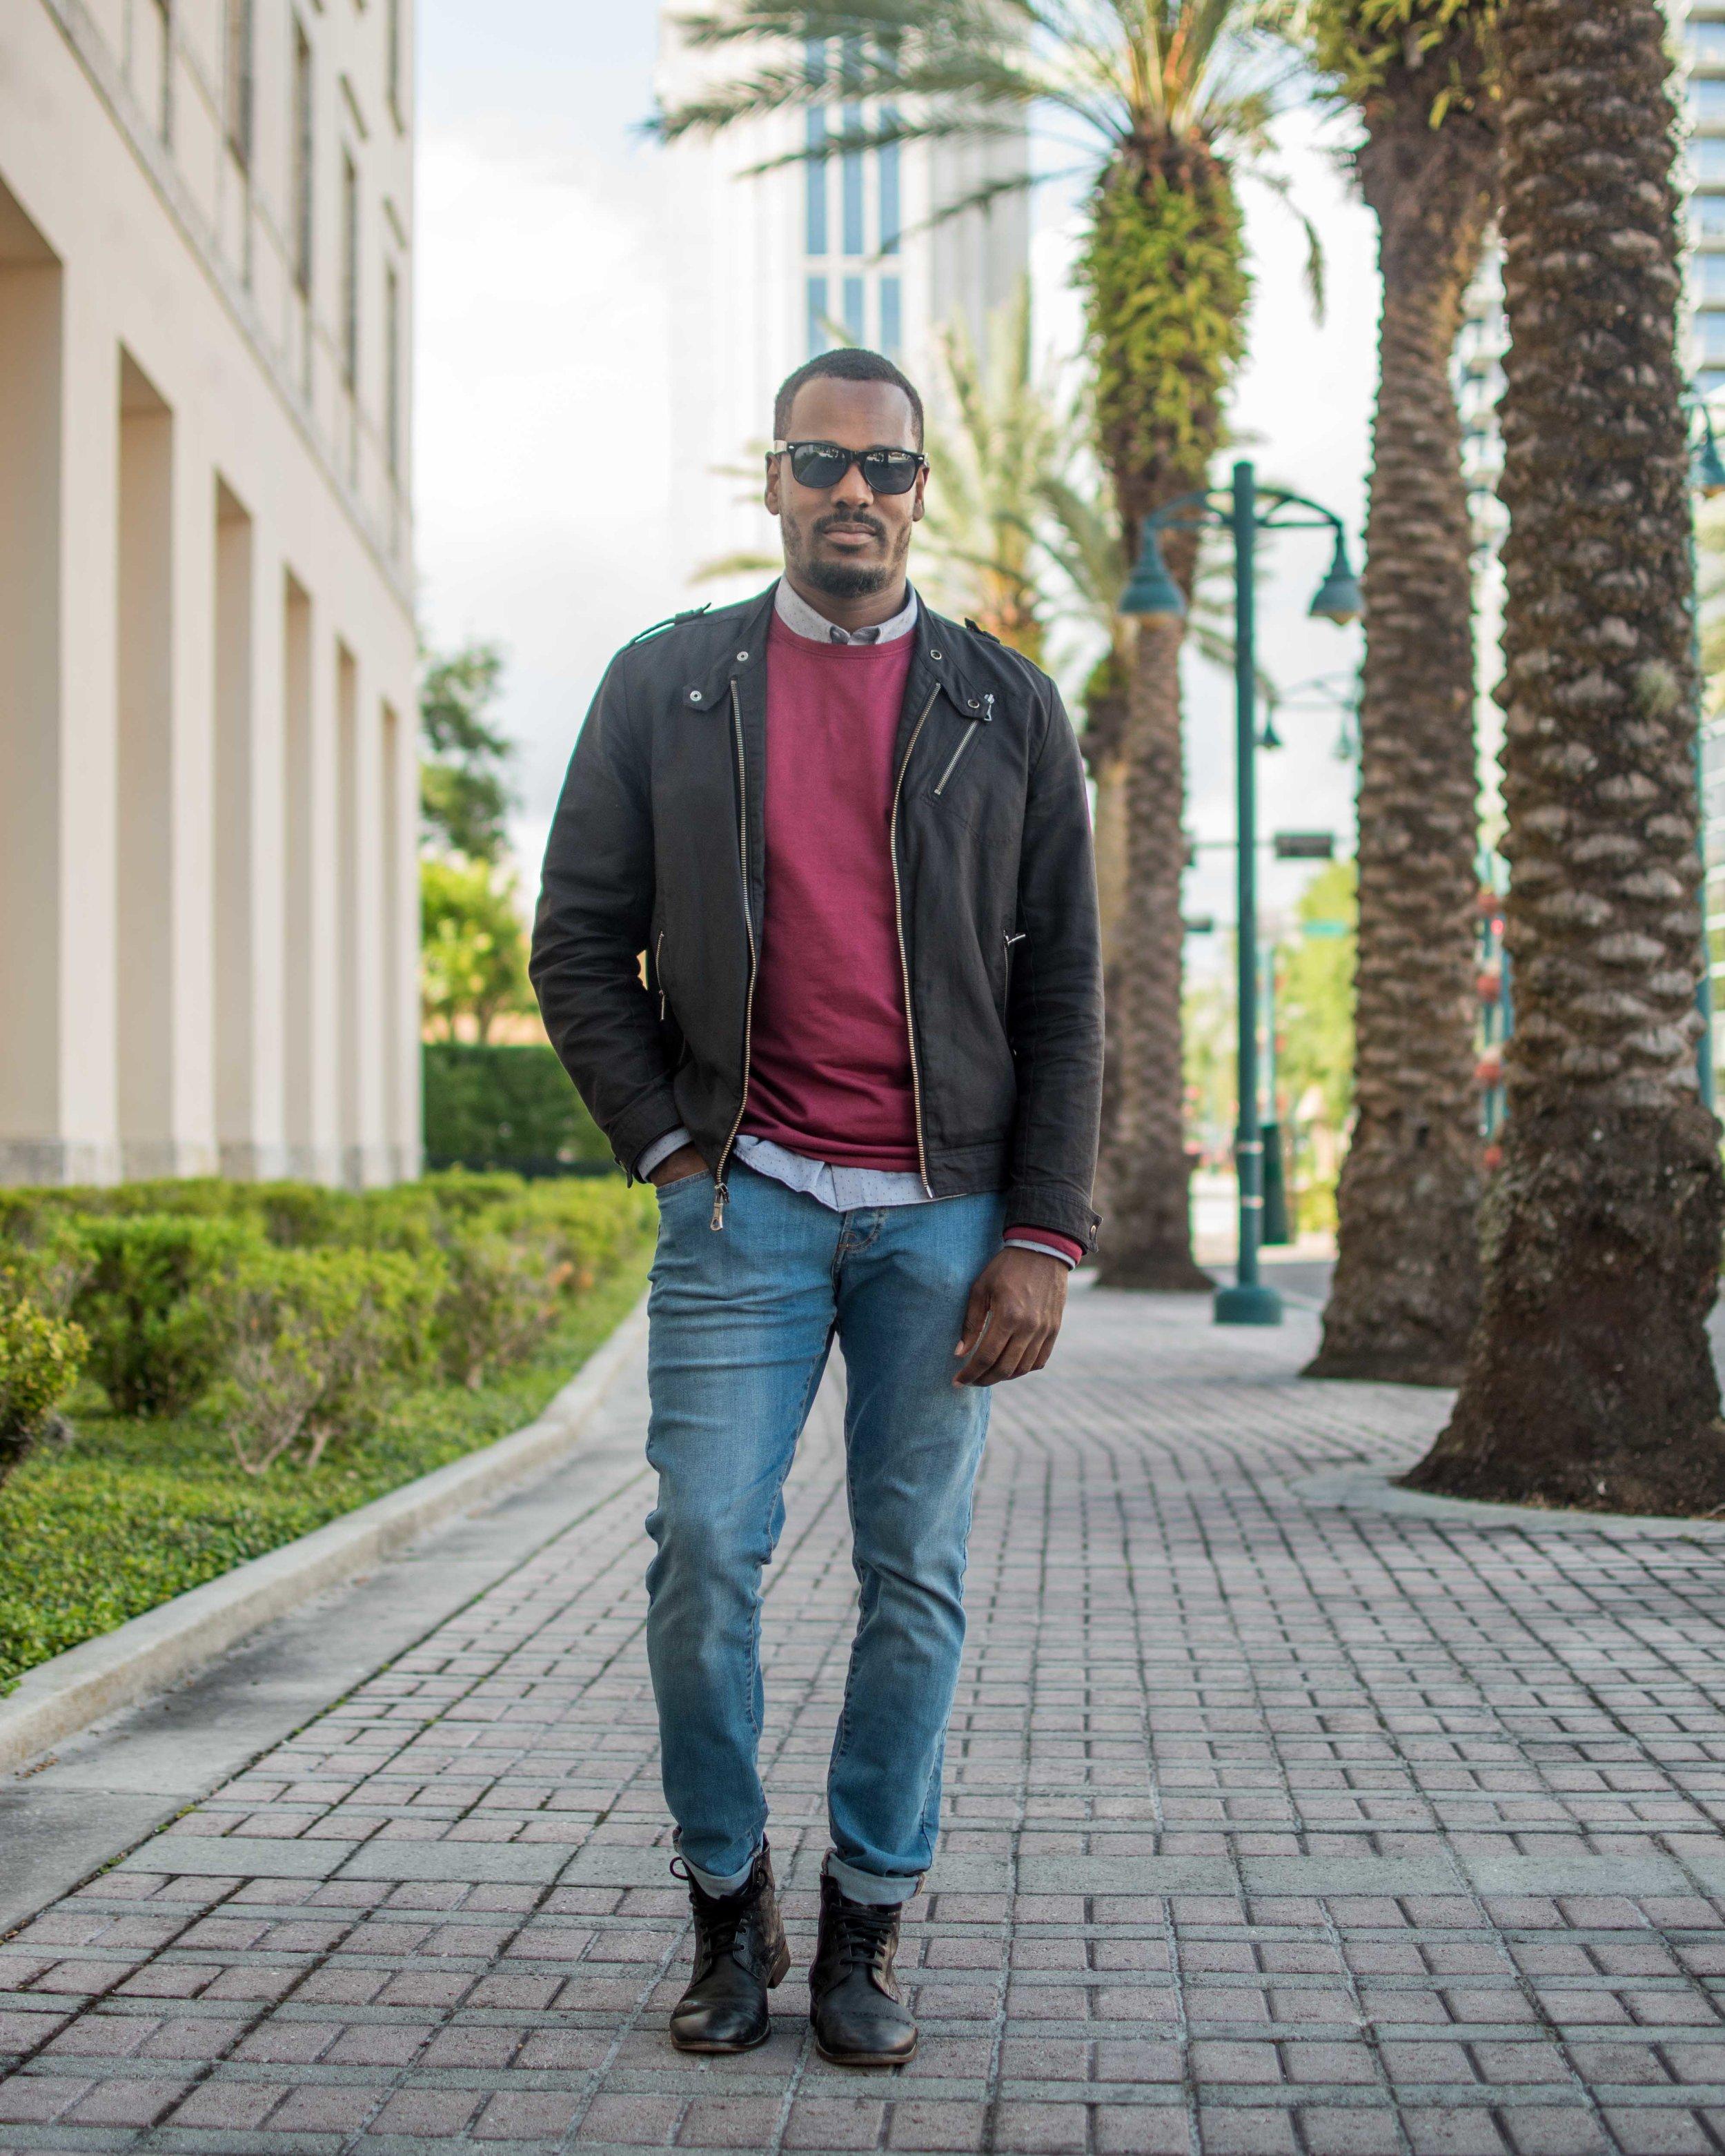 mens fashion spring 2018 forever 21 jacket hm jeans lindbergh shirt topman boots